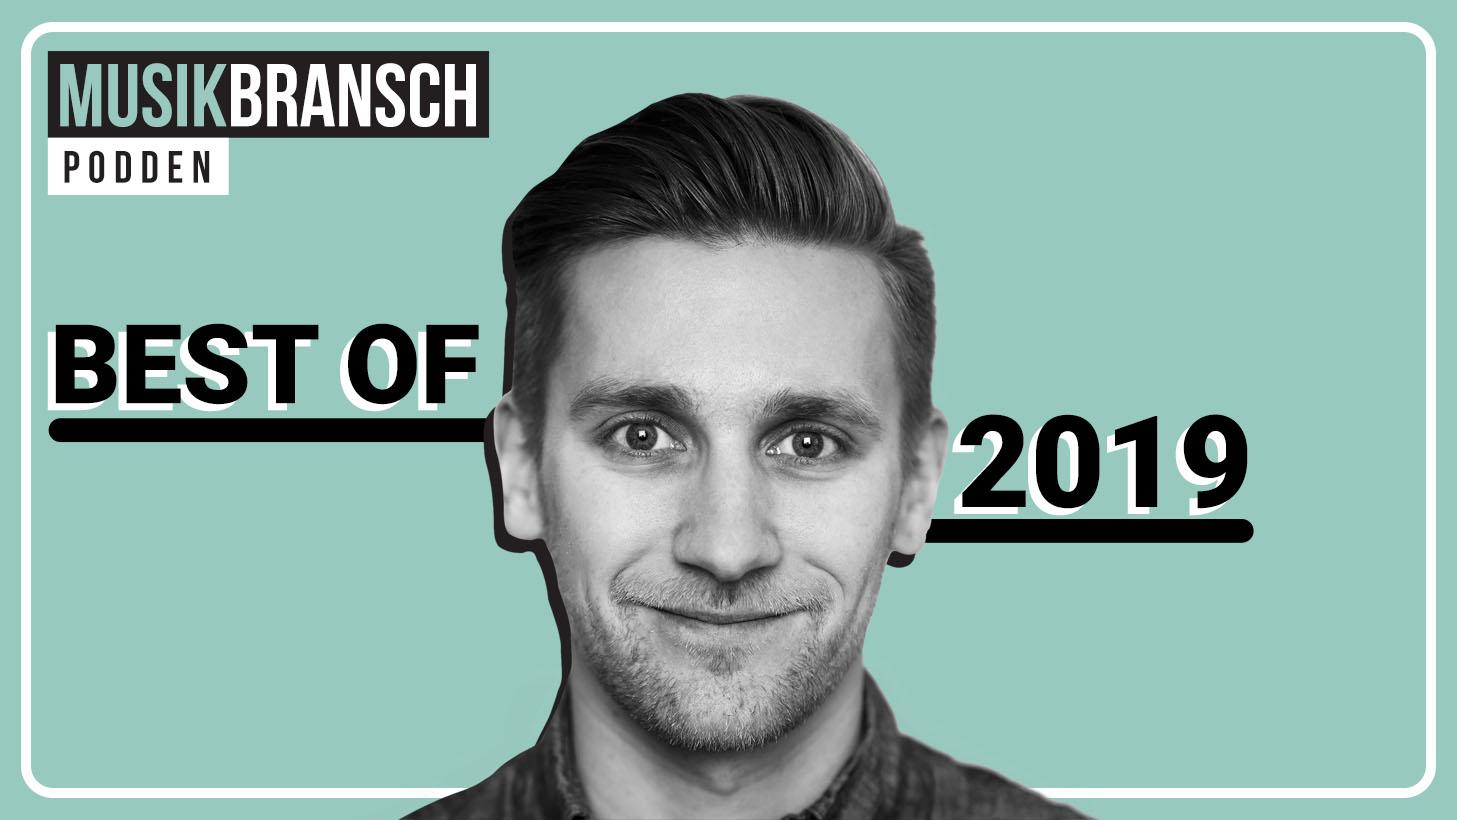 6 tips mot musikbranschen 2020 - Andreas Andersson